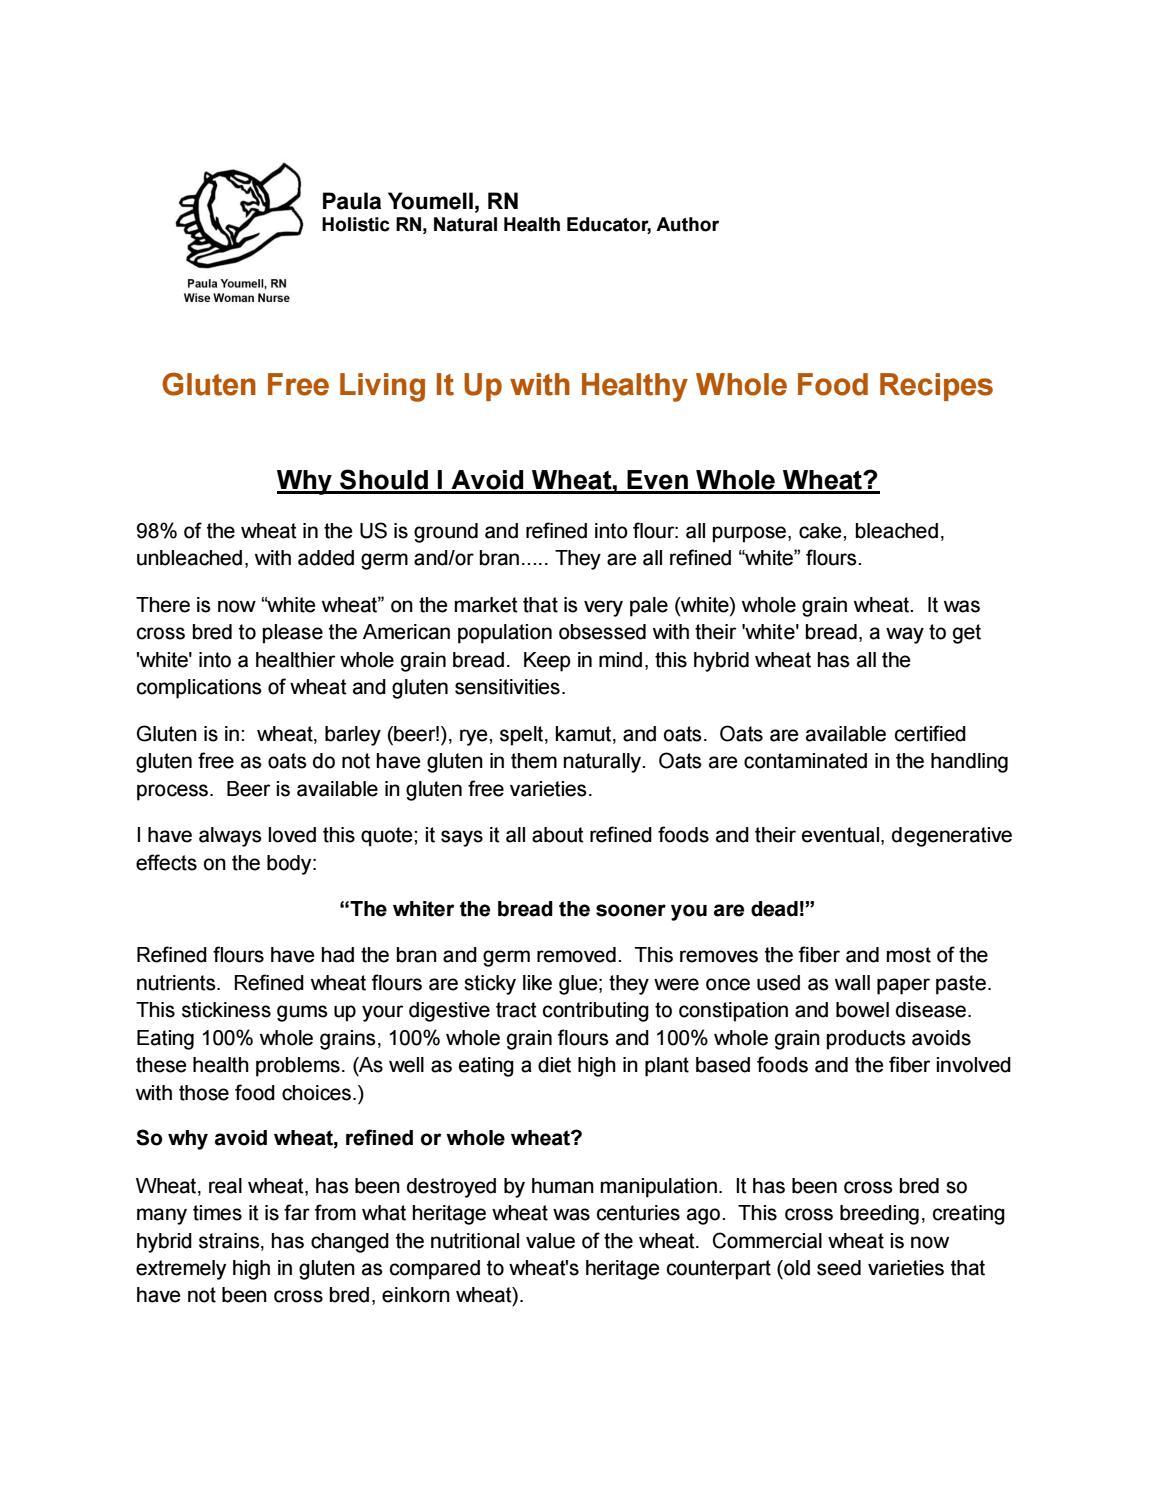 Gluten Free Recipes by Paula Youmell, RN, Wise Woman Nurse